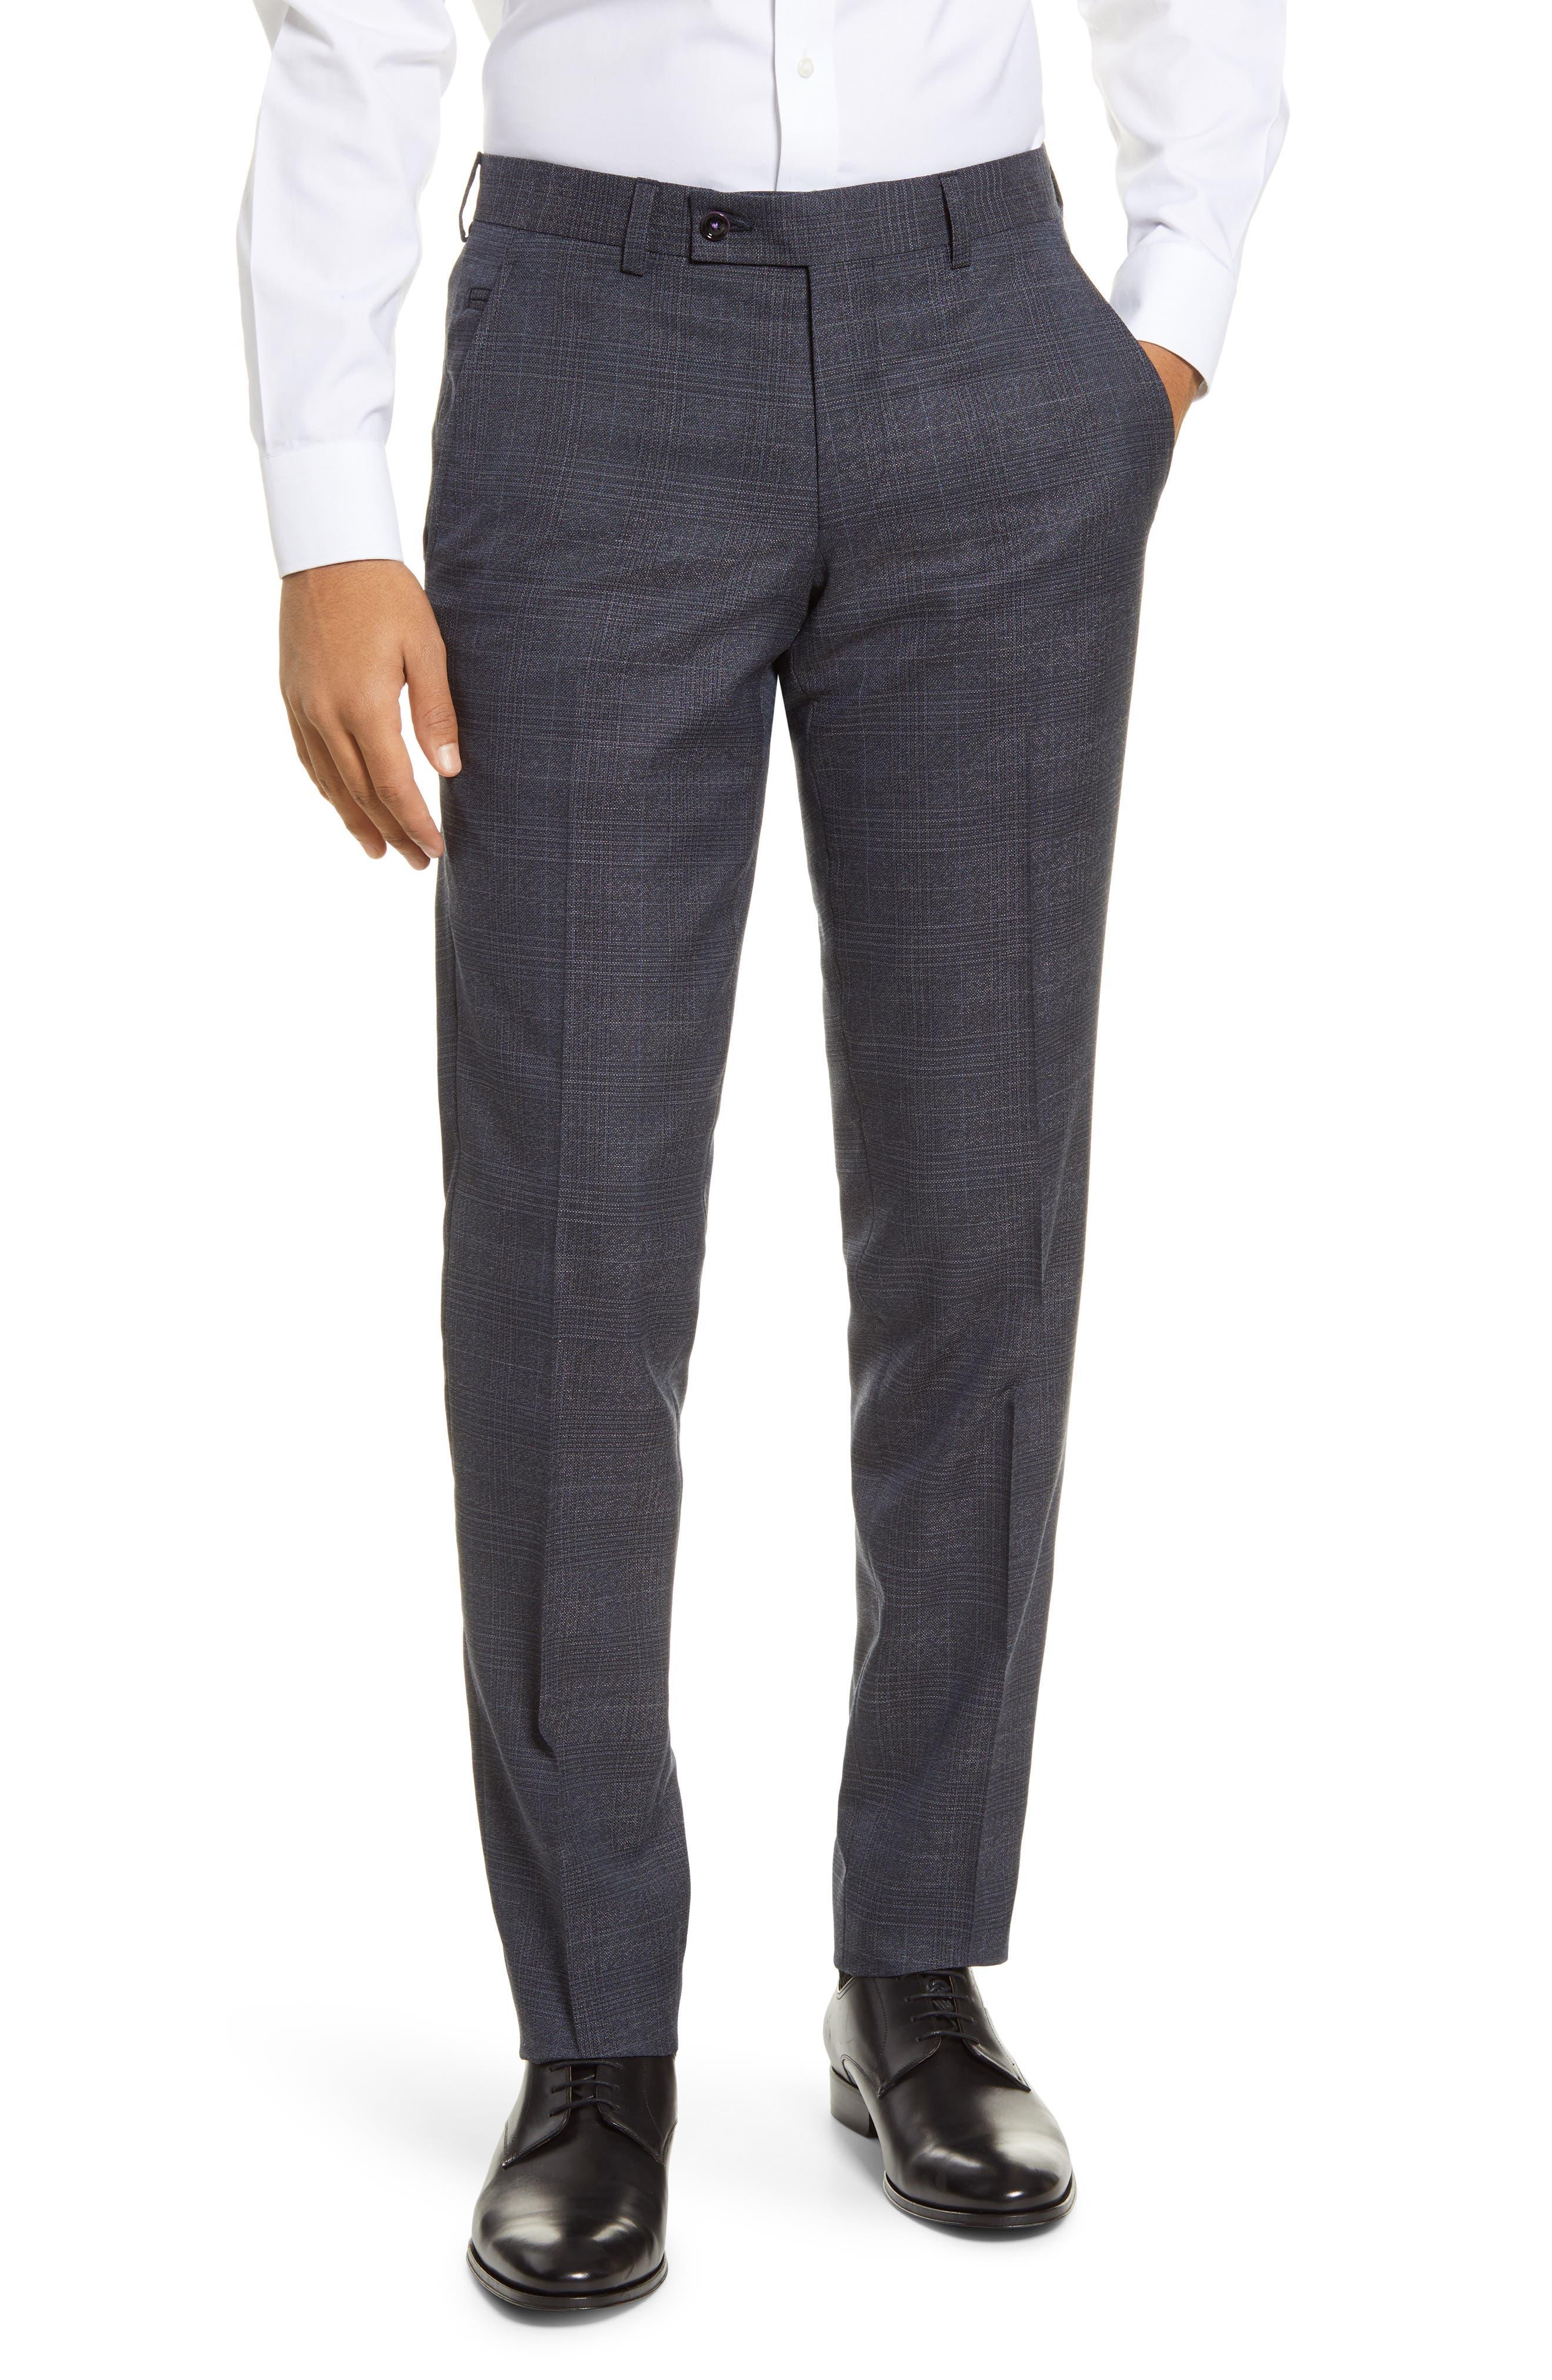 Murano 100/% Linen Casual Dress Pants Men Flat Front W 30 32  33 34 36 L 32 New